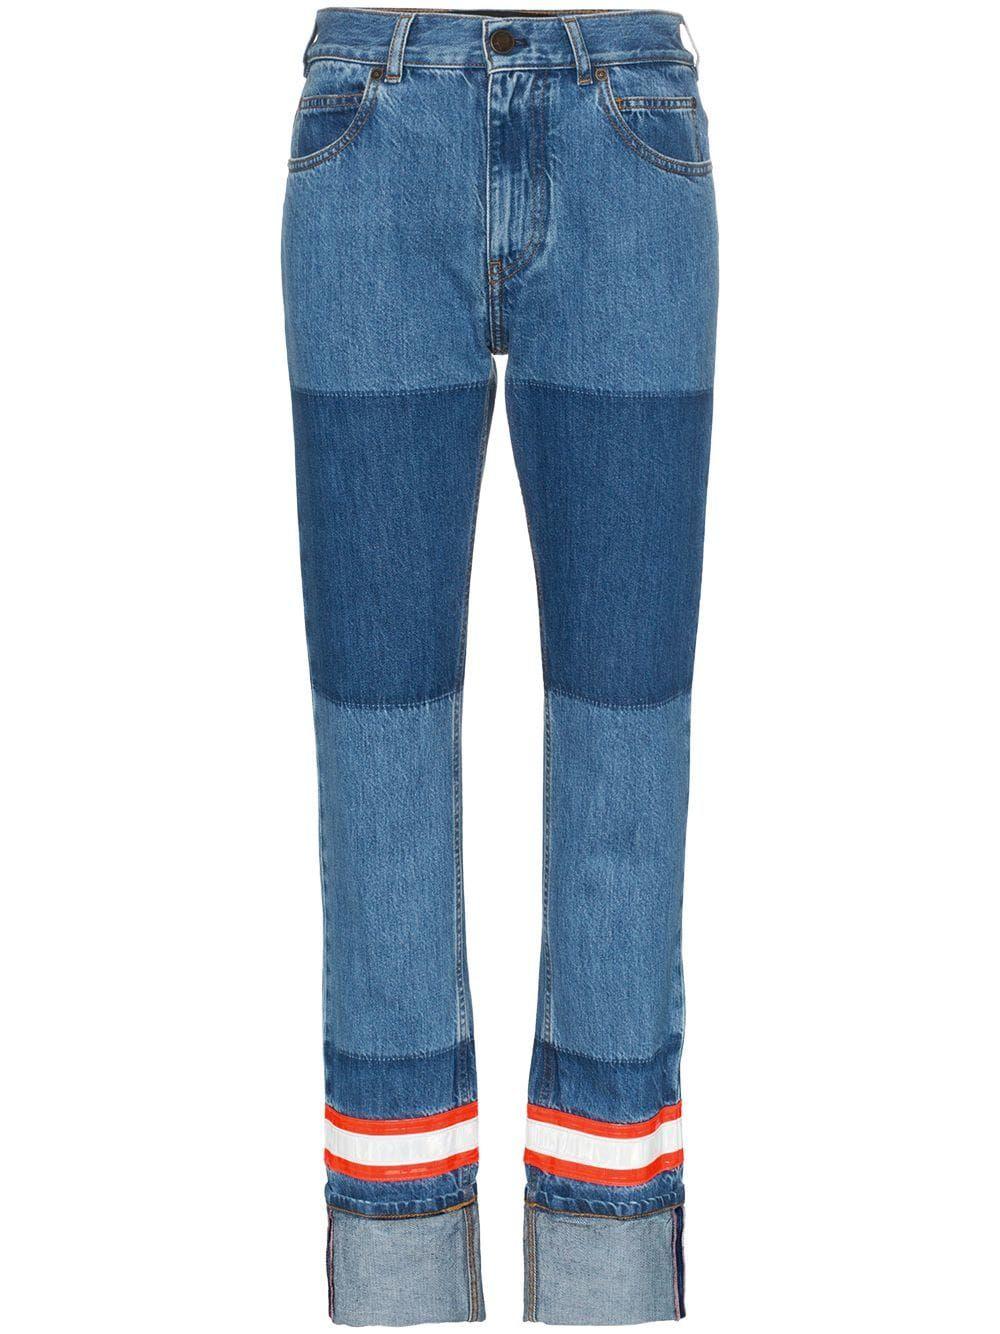 7939e025ec7646 Calvin Klein 205W39nyc fire tape applique straight jeans - Blue in ...